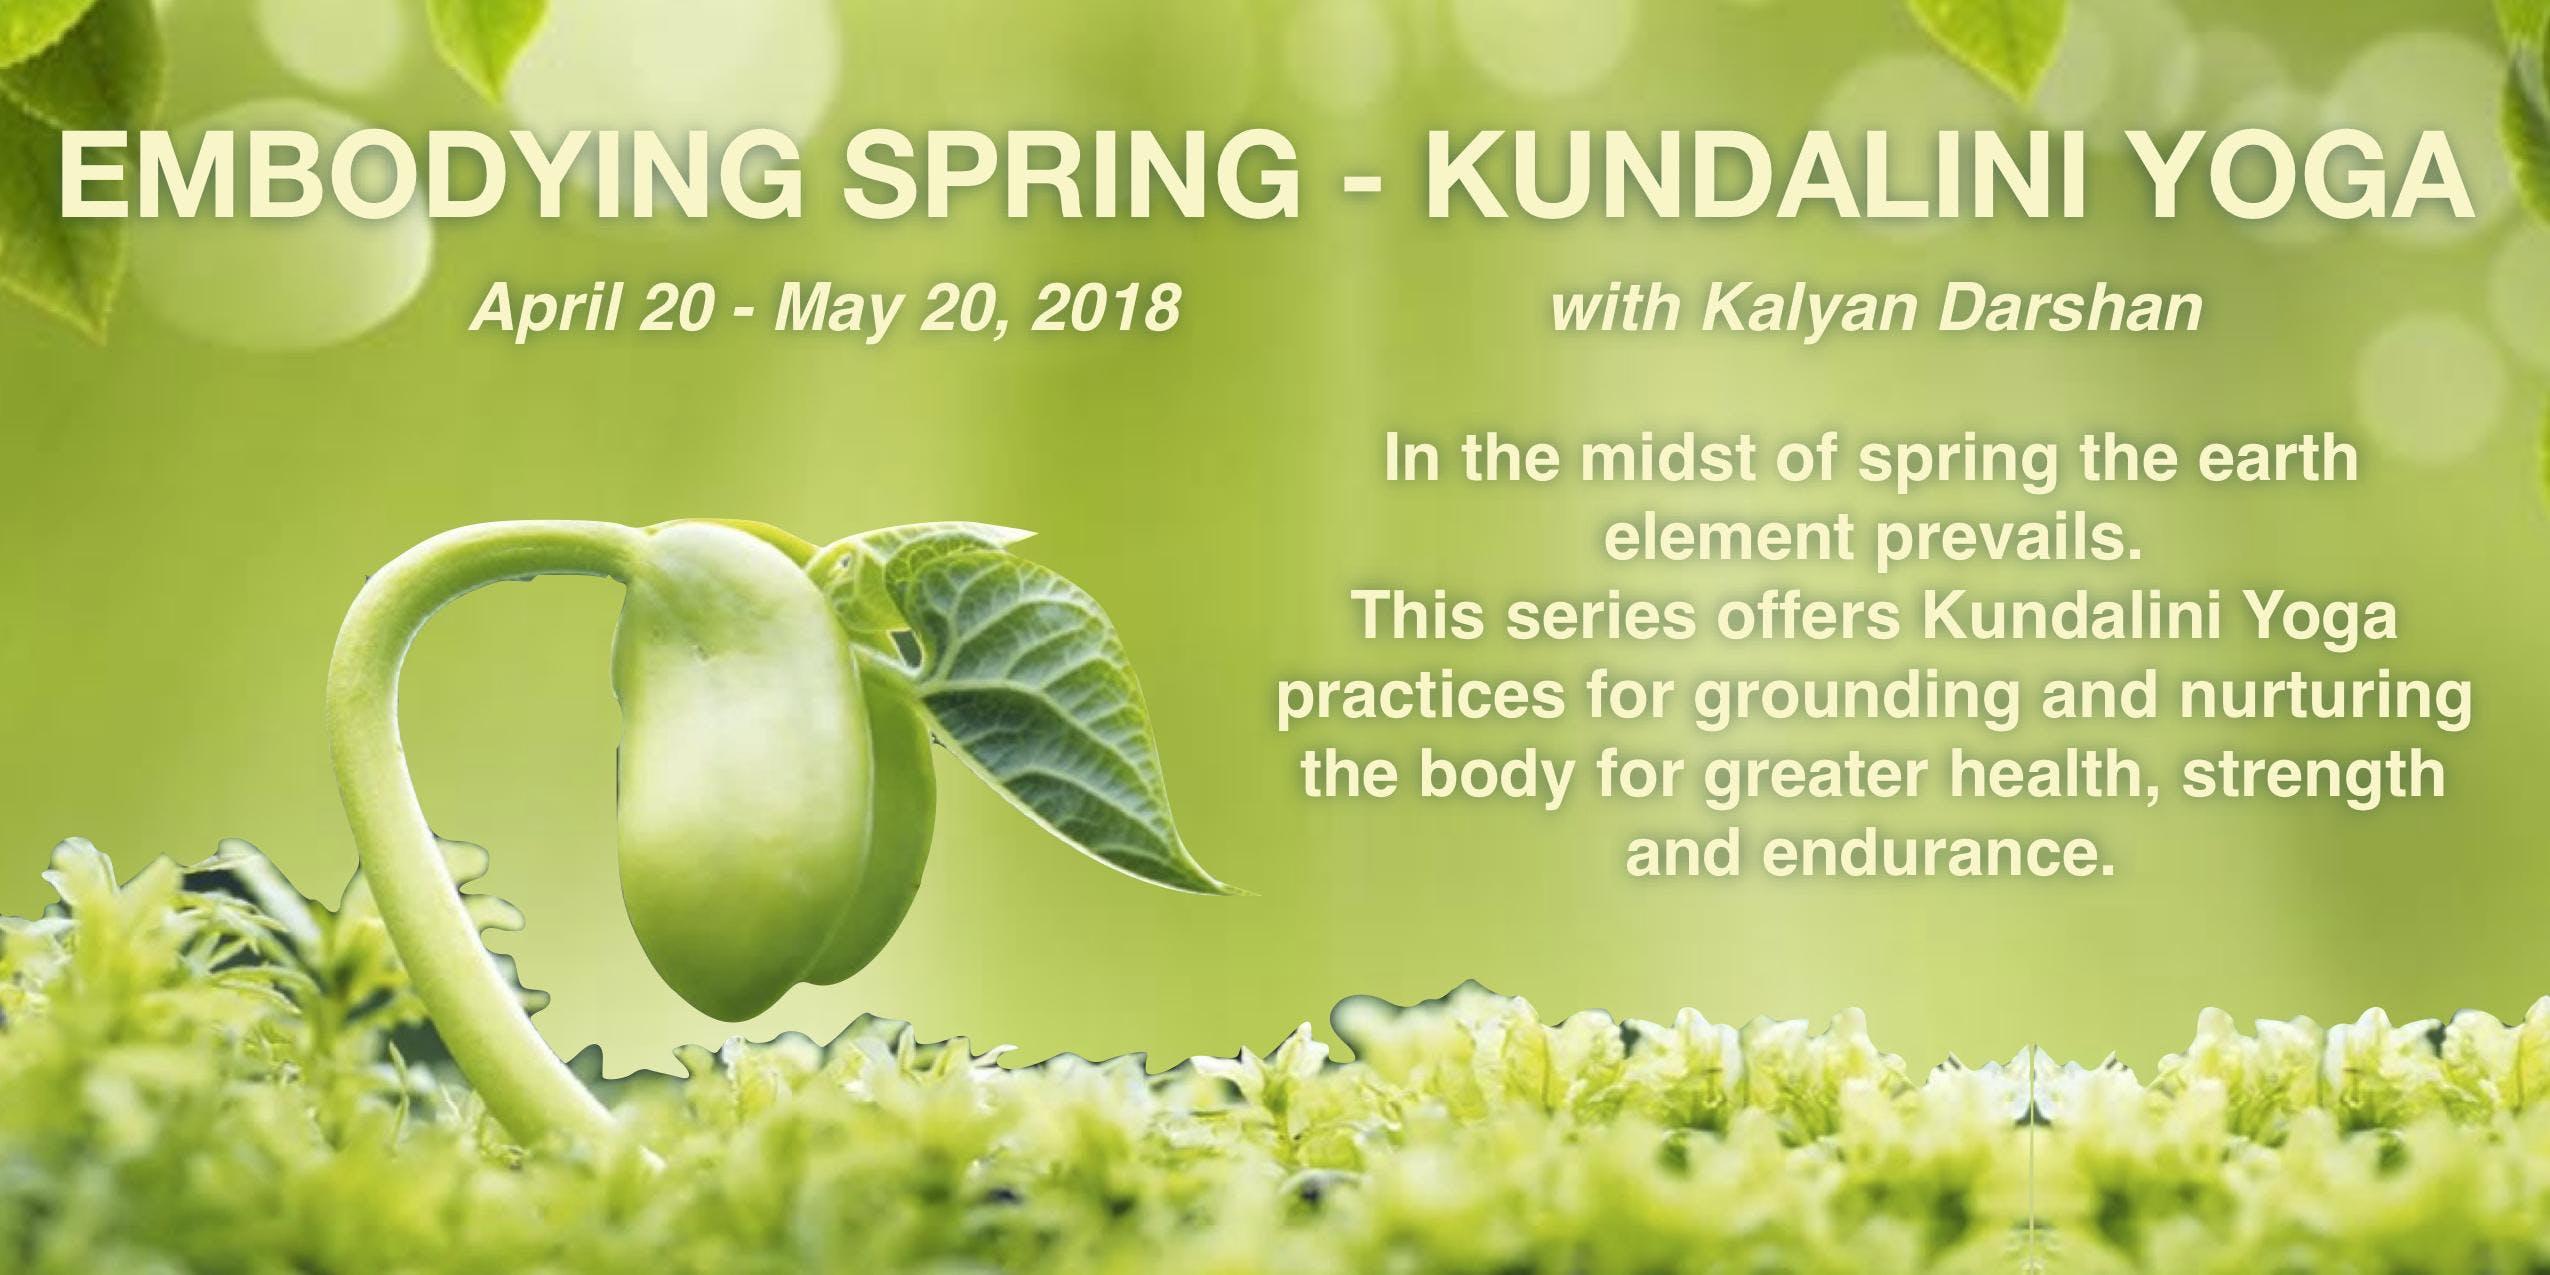 Embodying Spring - Kundalini Yoga for Self-Care and Grounding